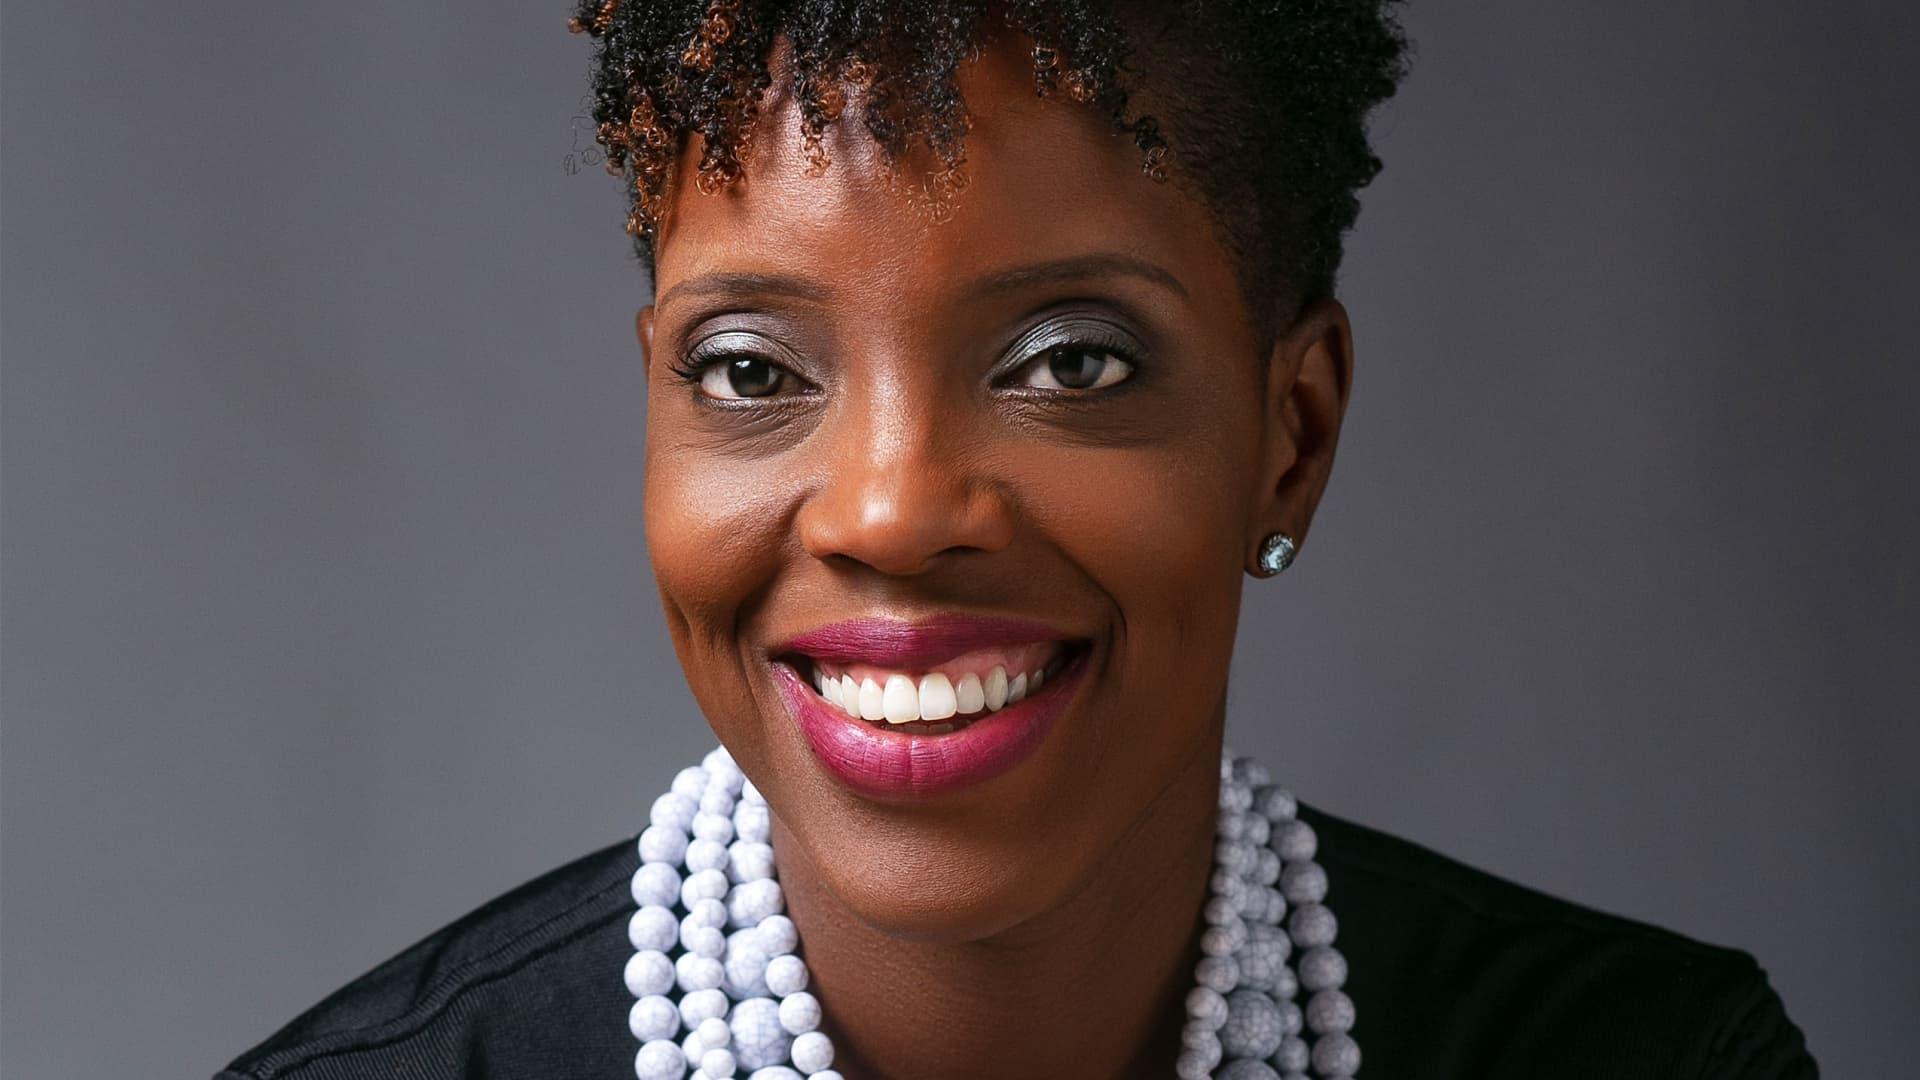 Aisha Nyandoro, founder of Magnolia Mother's Trust